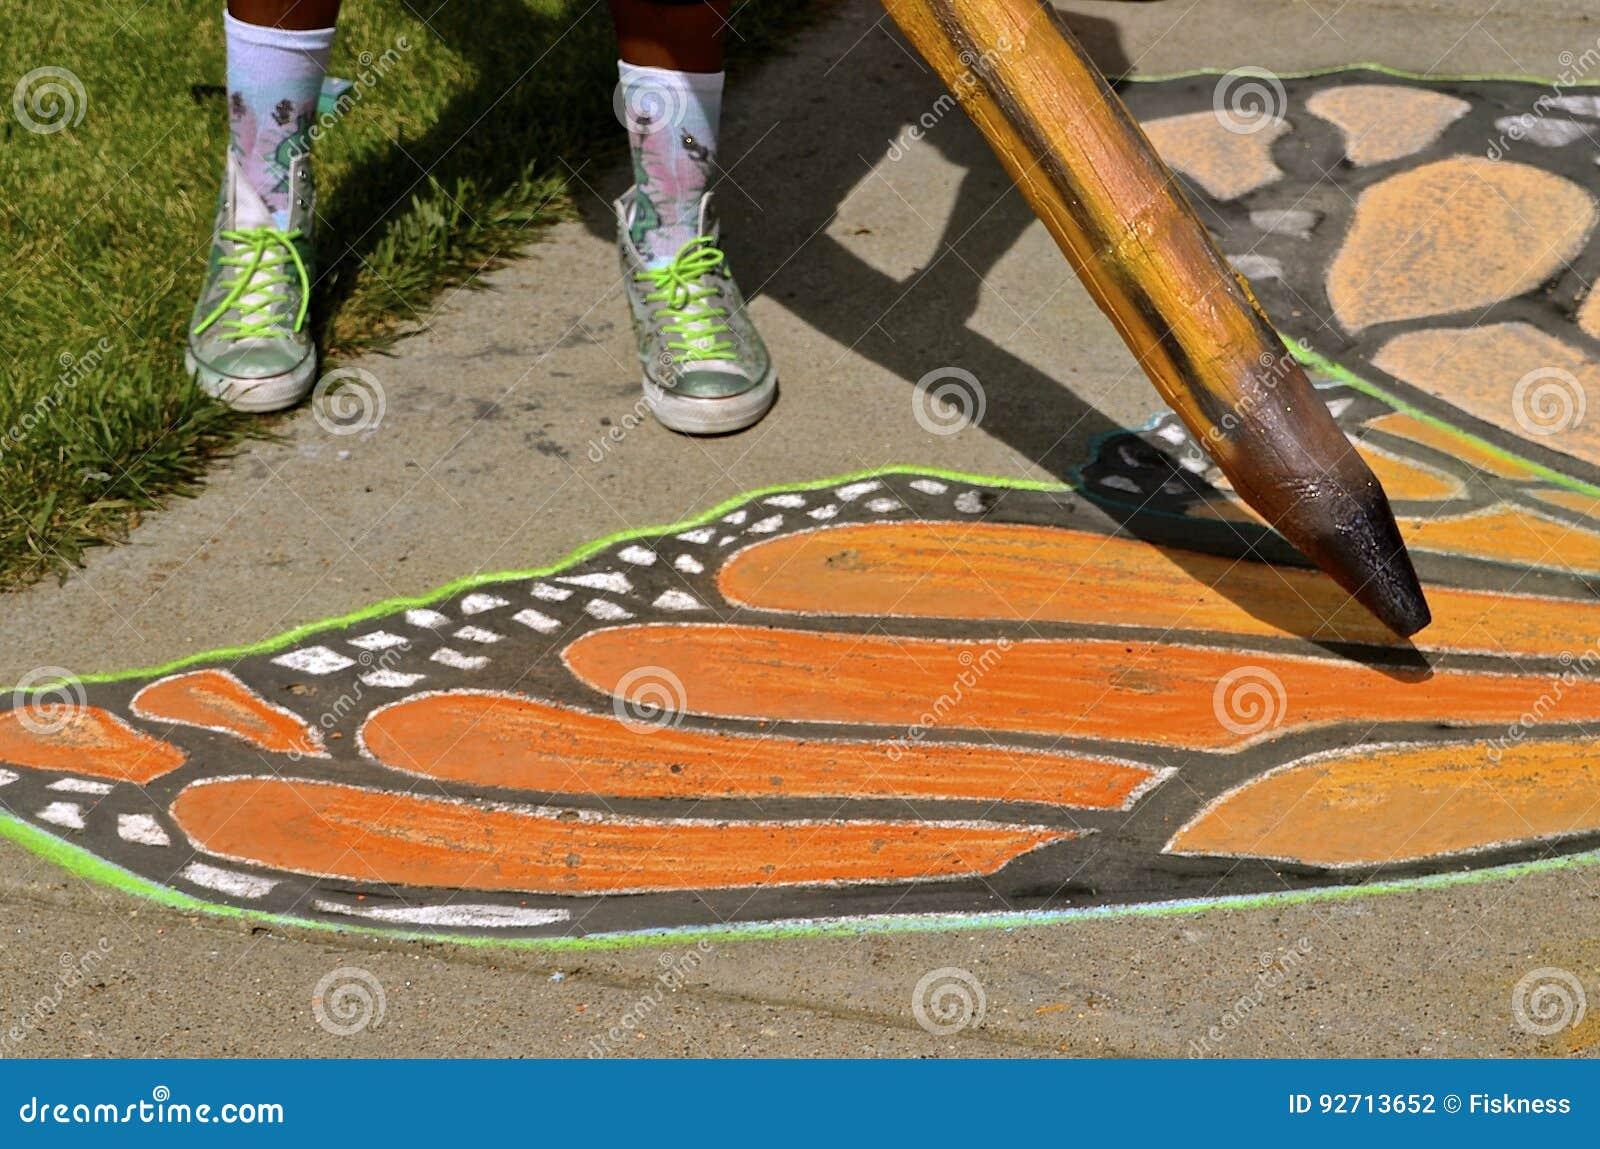 Chalk art of a butterfly wing